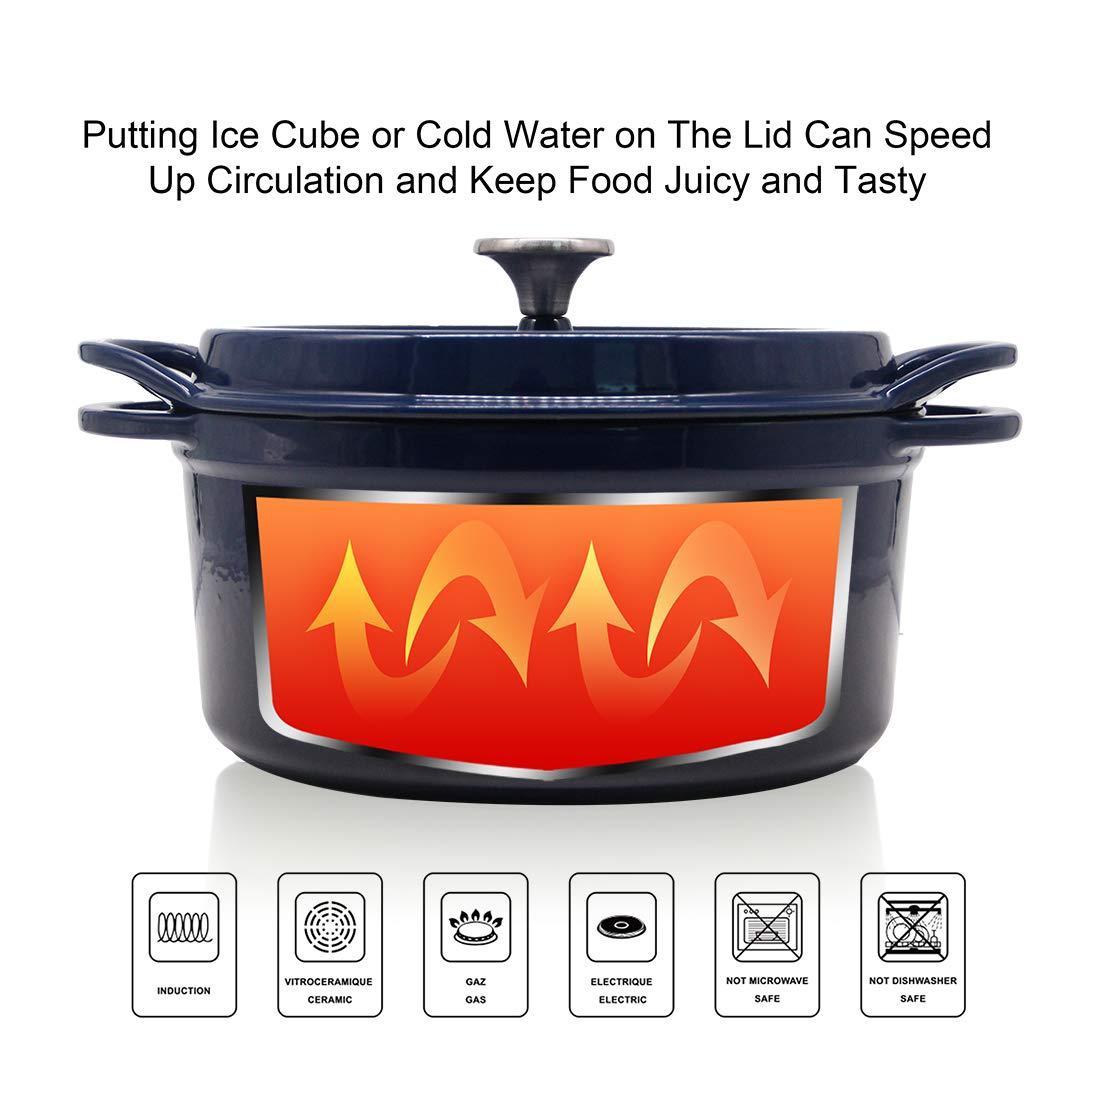 Cast Iron Dutch Oven Enameled Cooking Pot Nonstick Ceramic Cookware 4.5 Quart Navy T H Danc